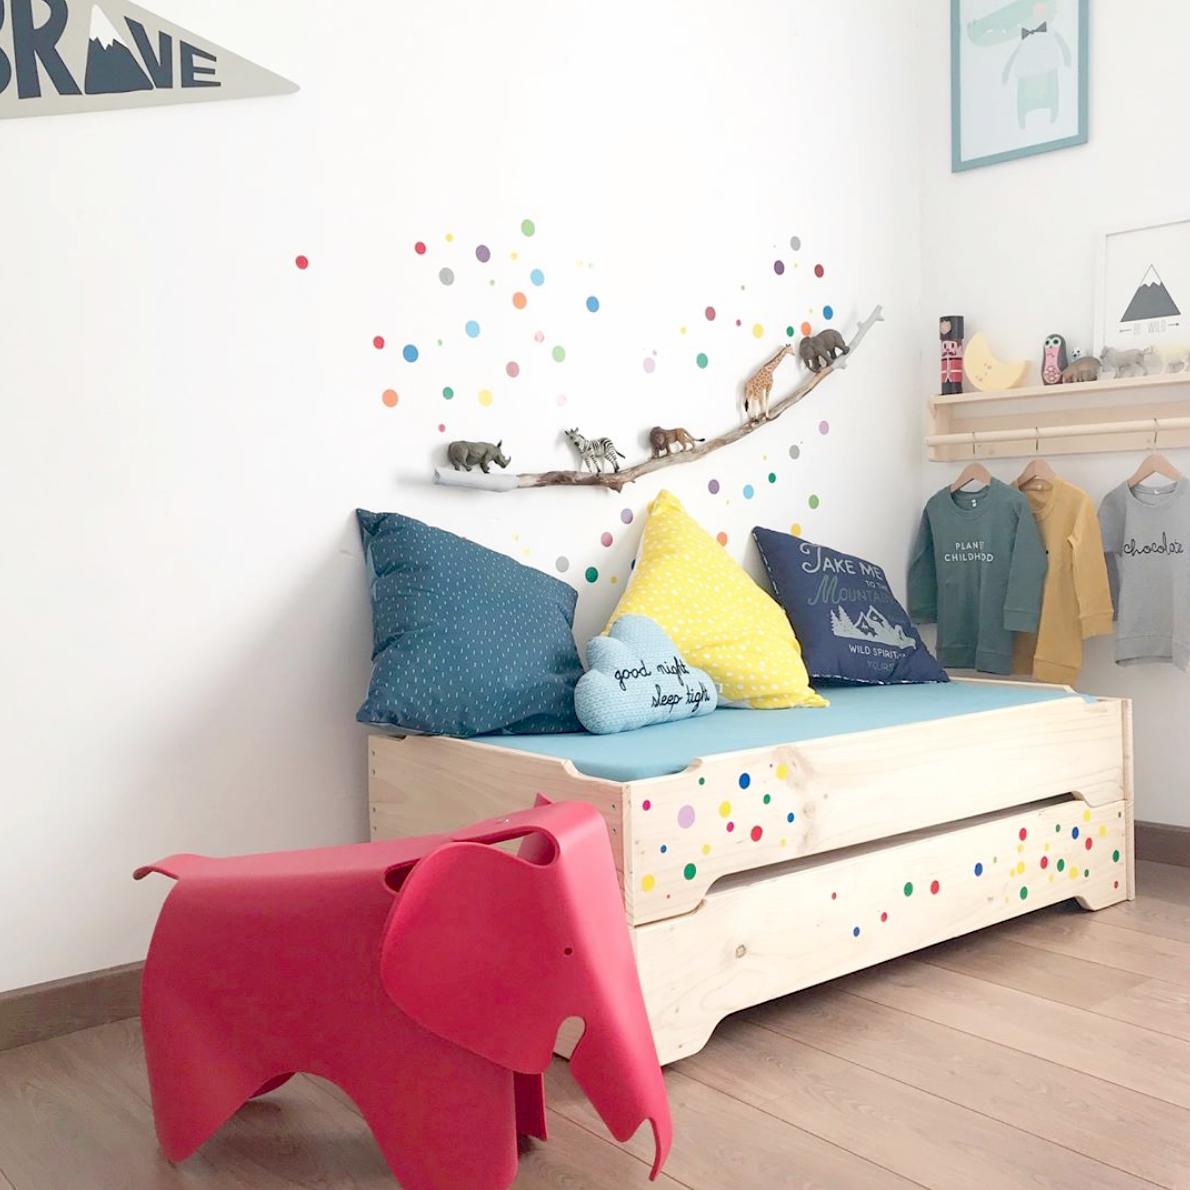 Camas Montessori baratas